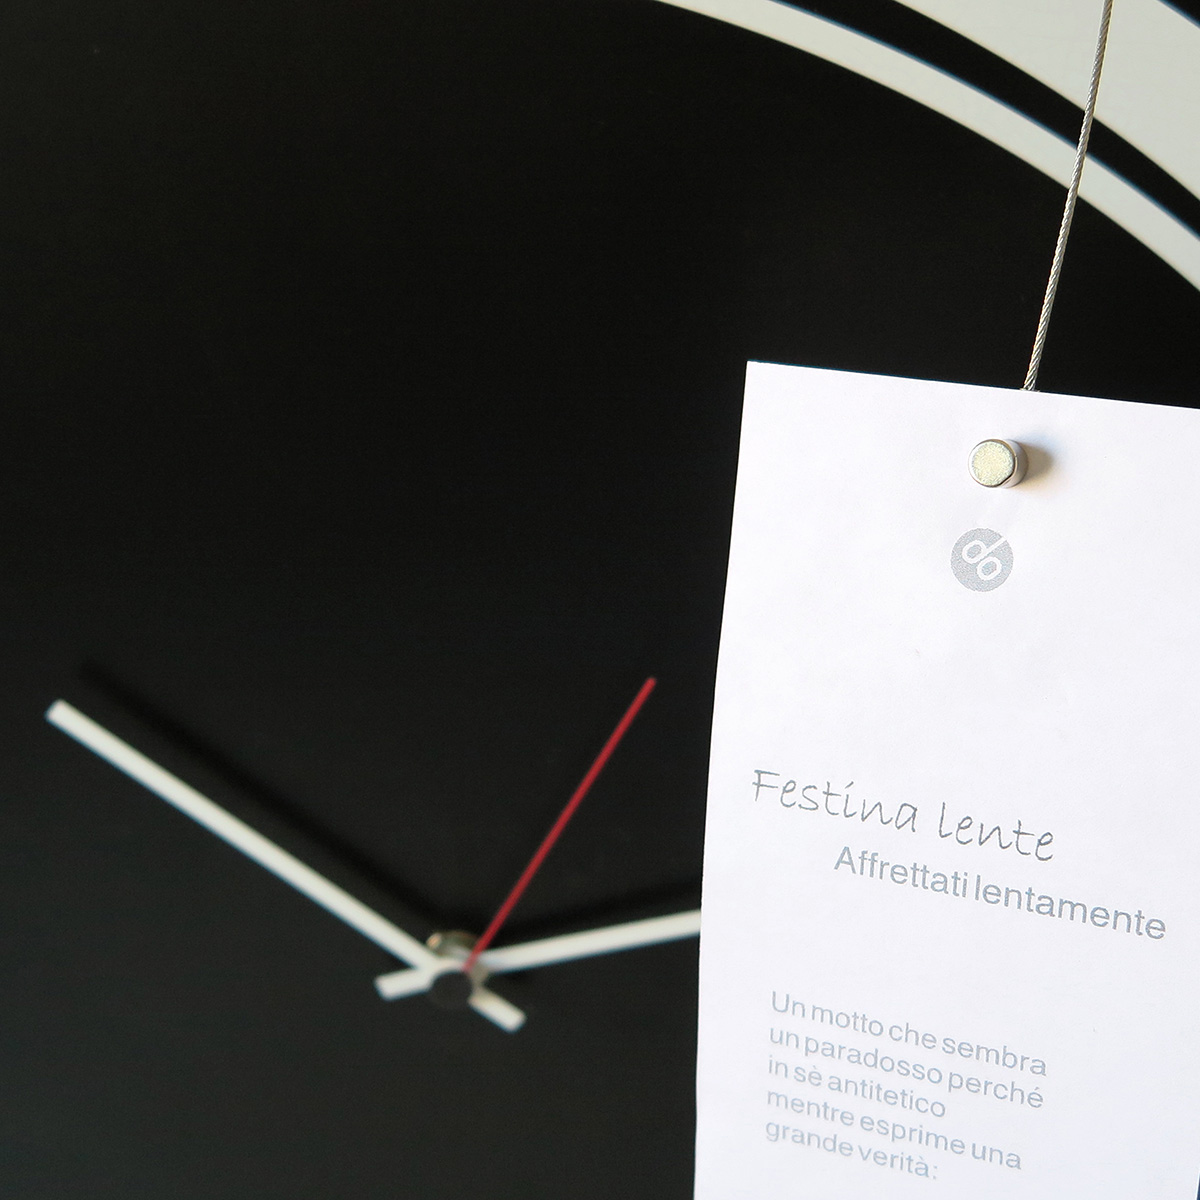 orologio-parete-design-calligrafia-wall-clock-detail-enso-black